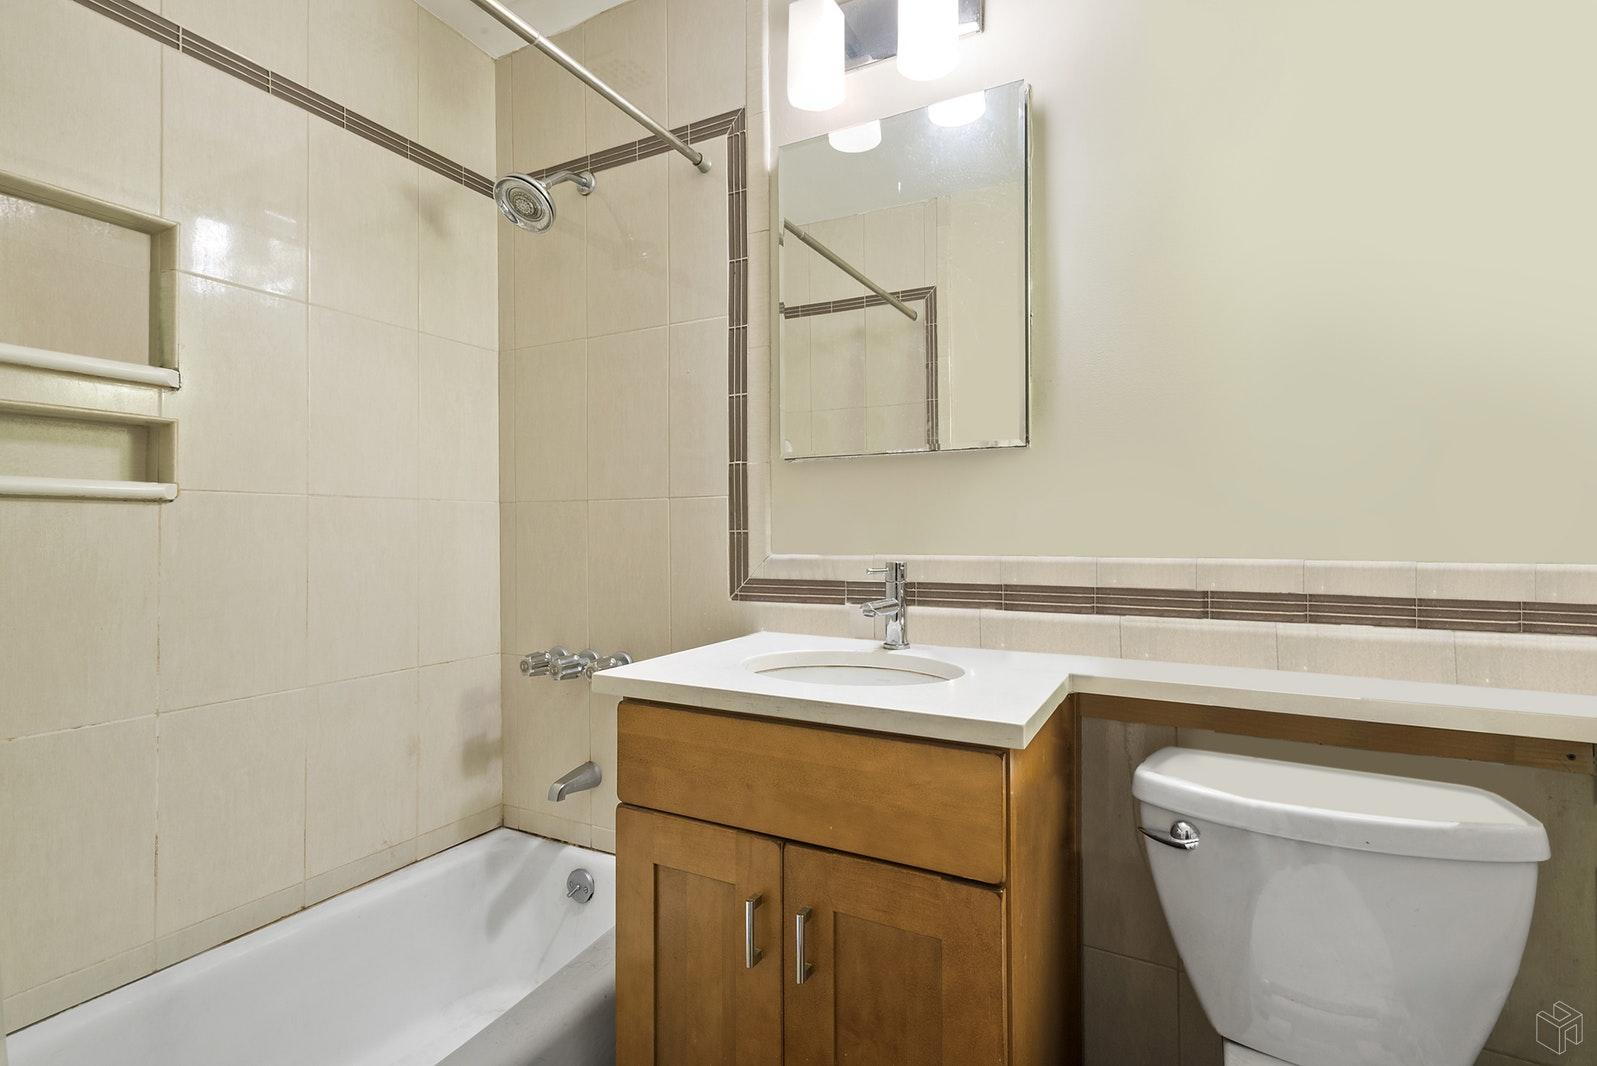 310 EAST 23RD STREET 5C, Gramercy Park, $2,595, Web #: 19475613